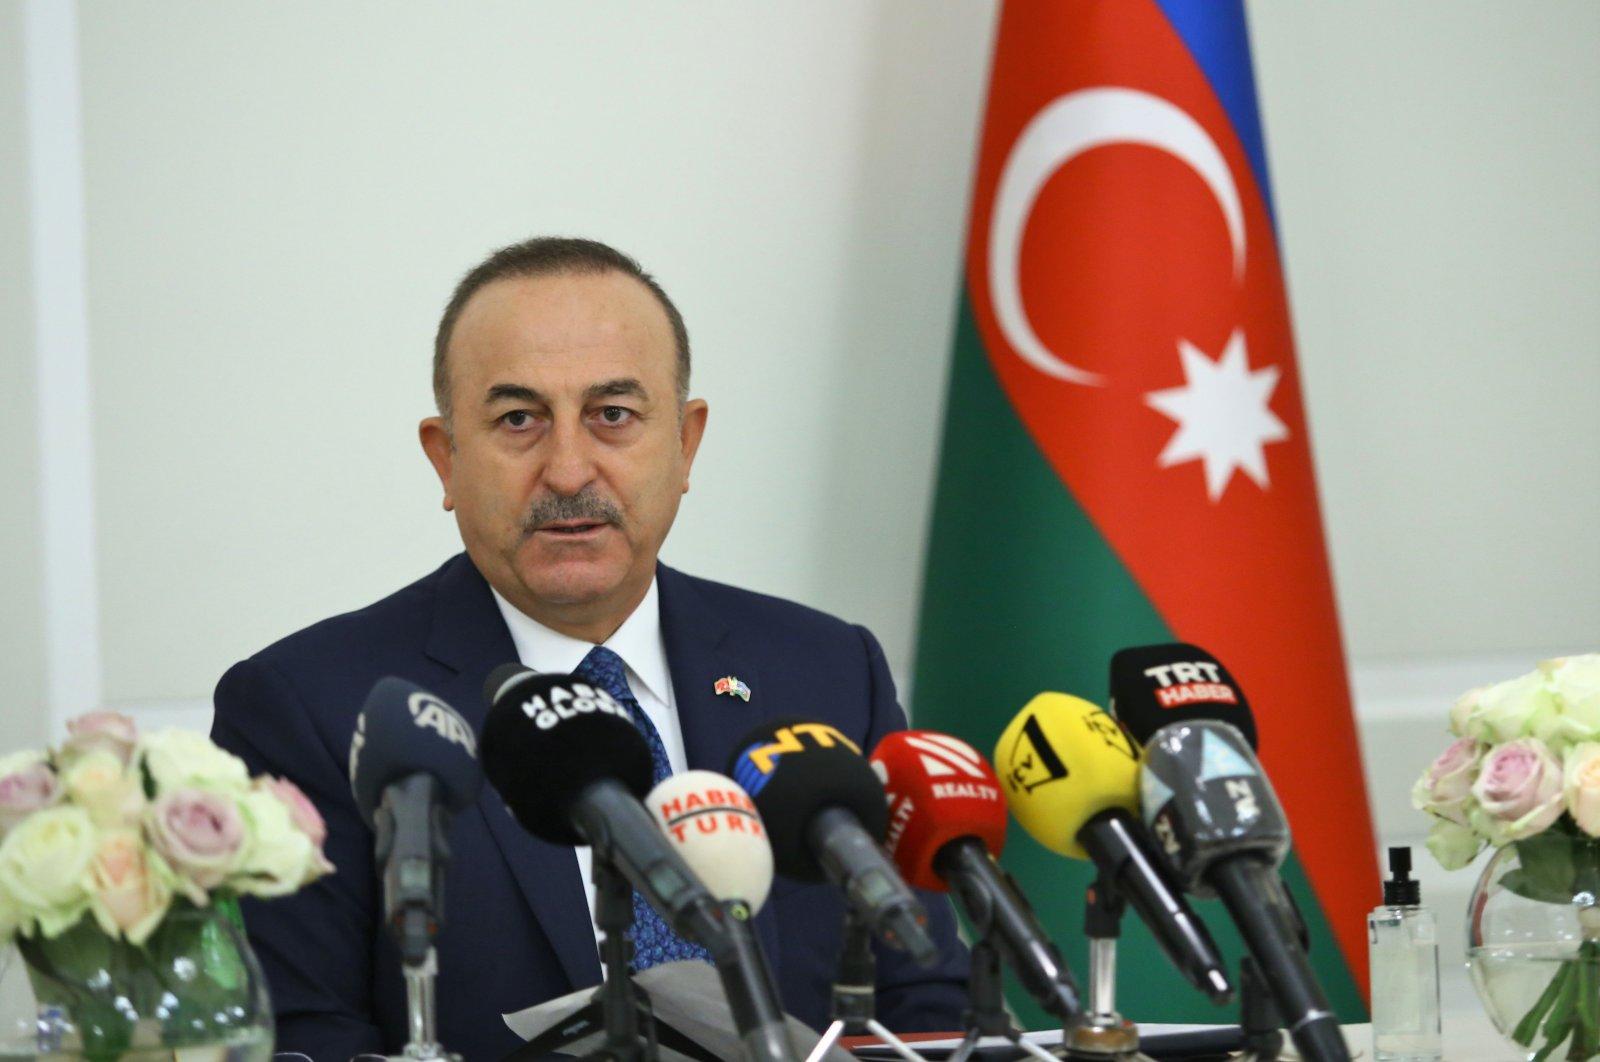 Foreign Minister Mevlüt Çavuşoğlu attends a news conference in the Azerbaijani capital Baku on Nov. 13, 2020 (AA File Photo)